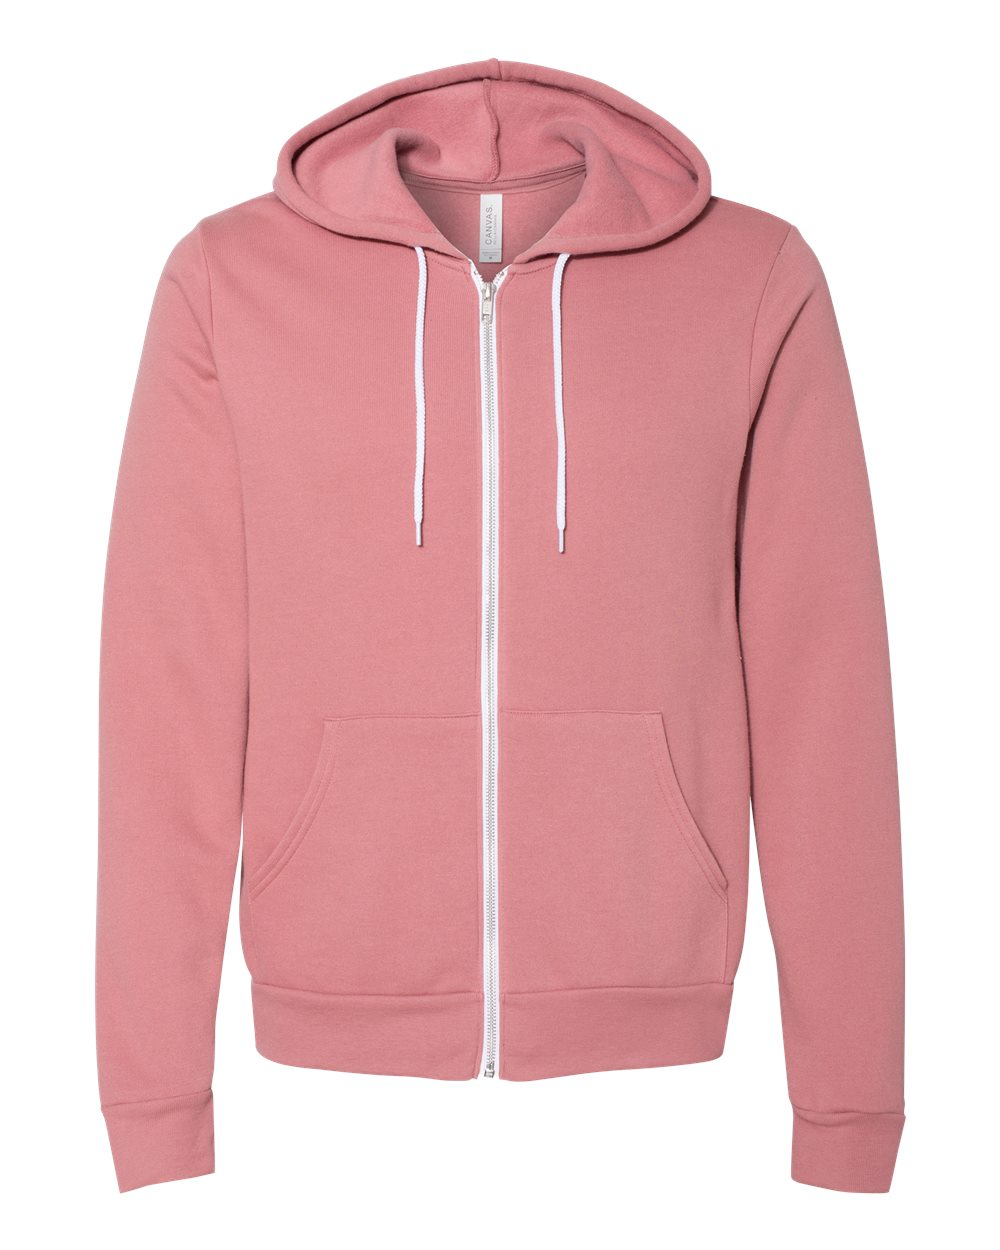 Bella-Canvas-Unisex-Full-Zip-Up-Hooded-Sweatshirt-Blank-Hoodie-3739-up-to-3XL thumbnail 68